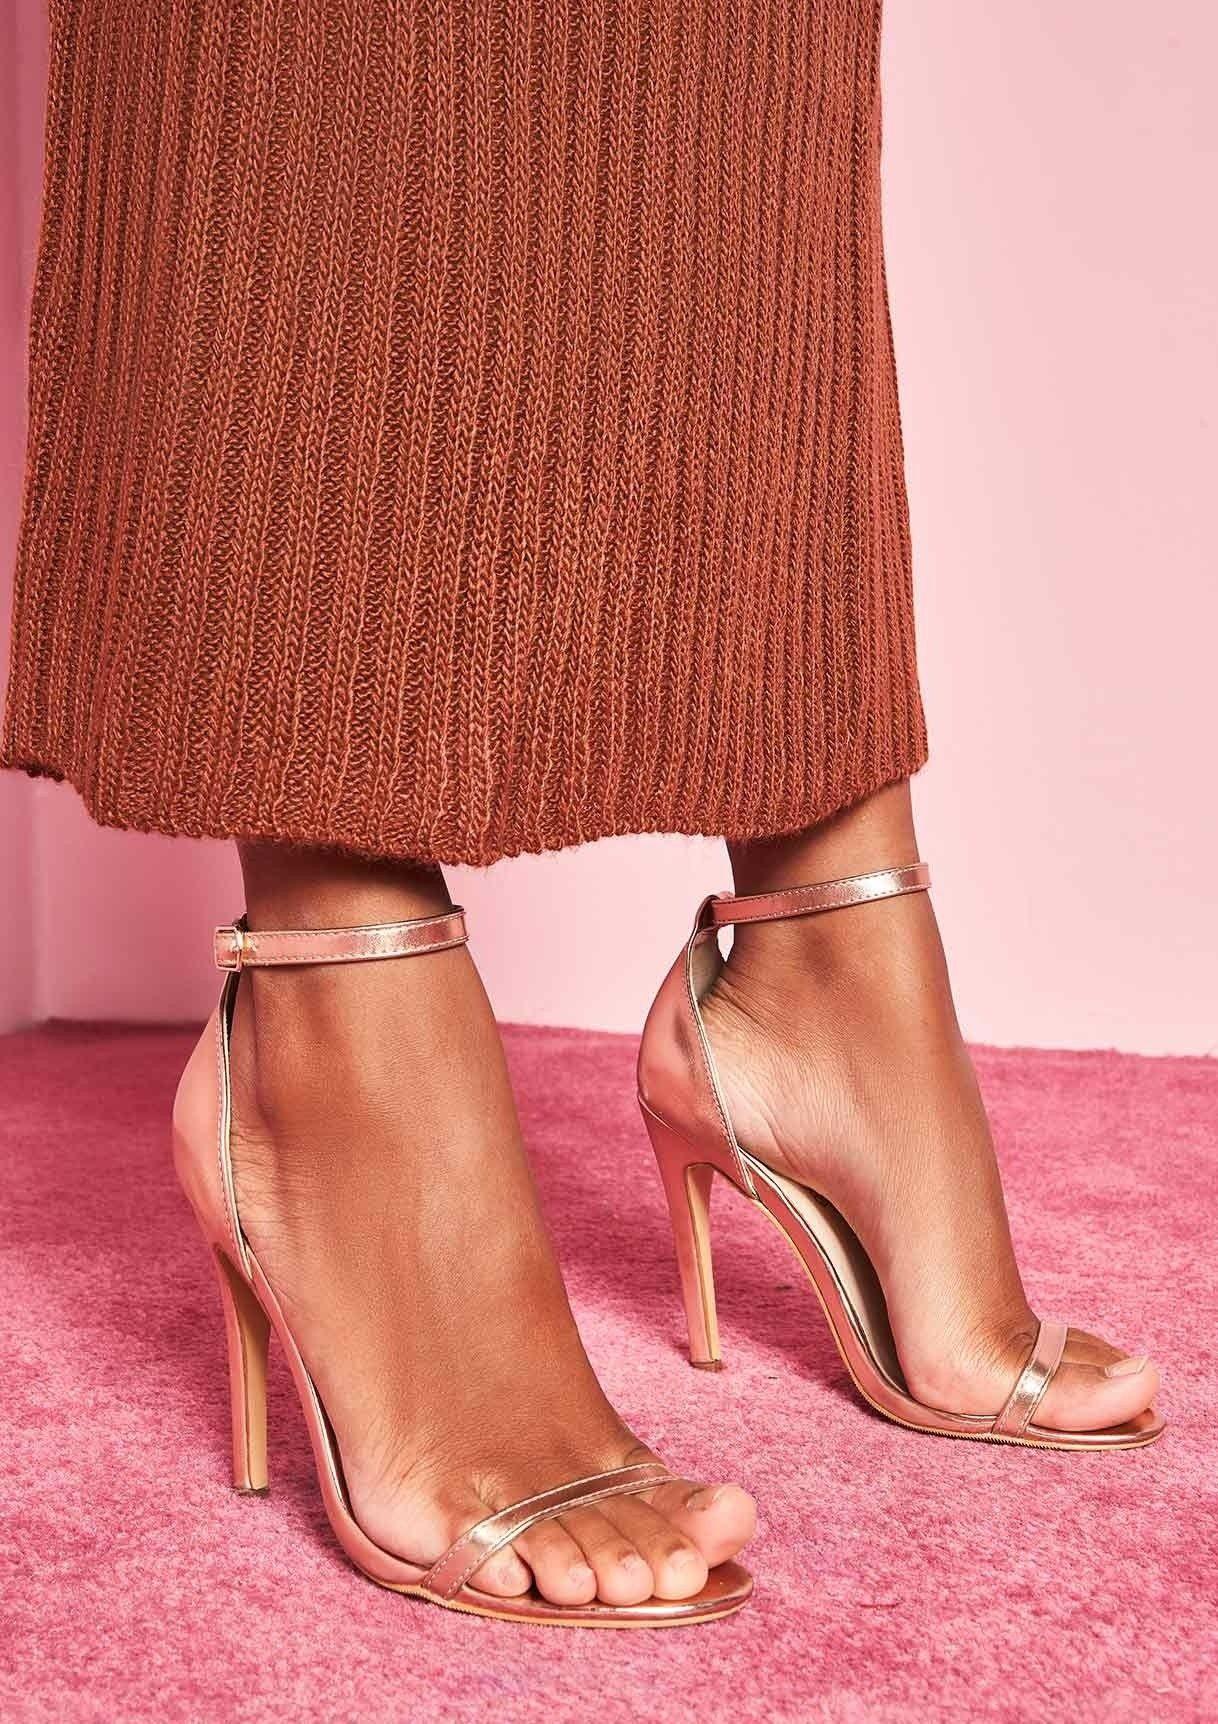 4c884844744 Missyempire - Valentia Rose Gold Ankle Strap Heels